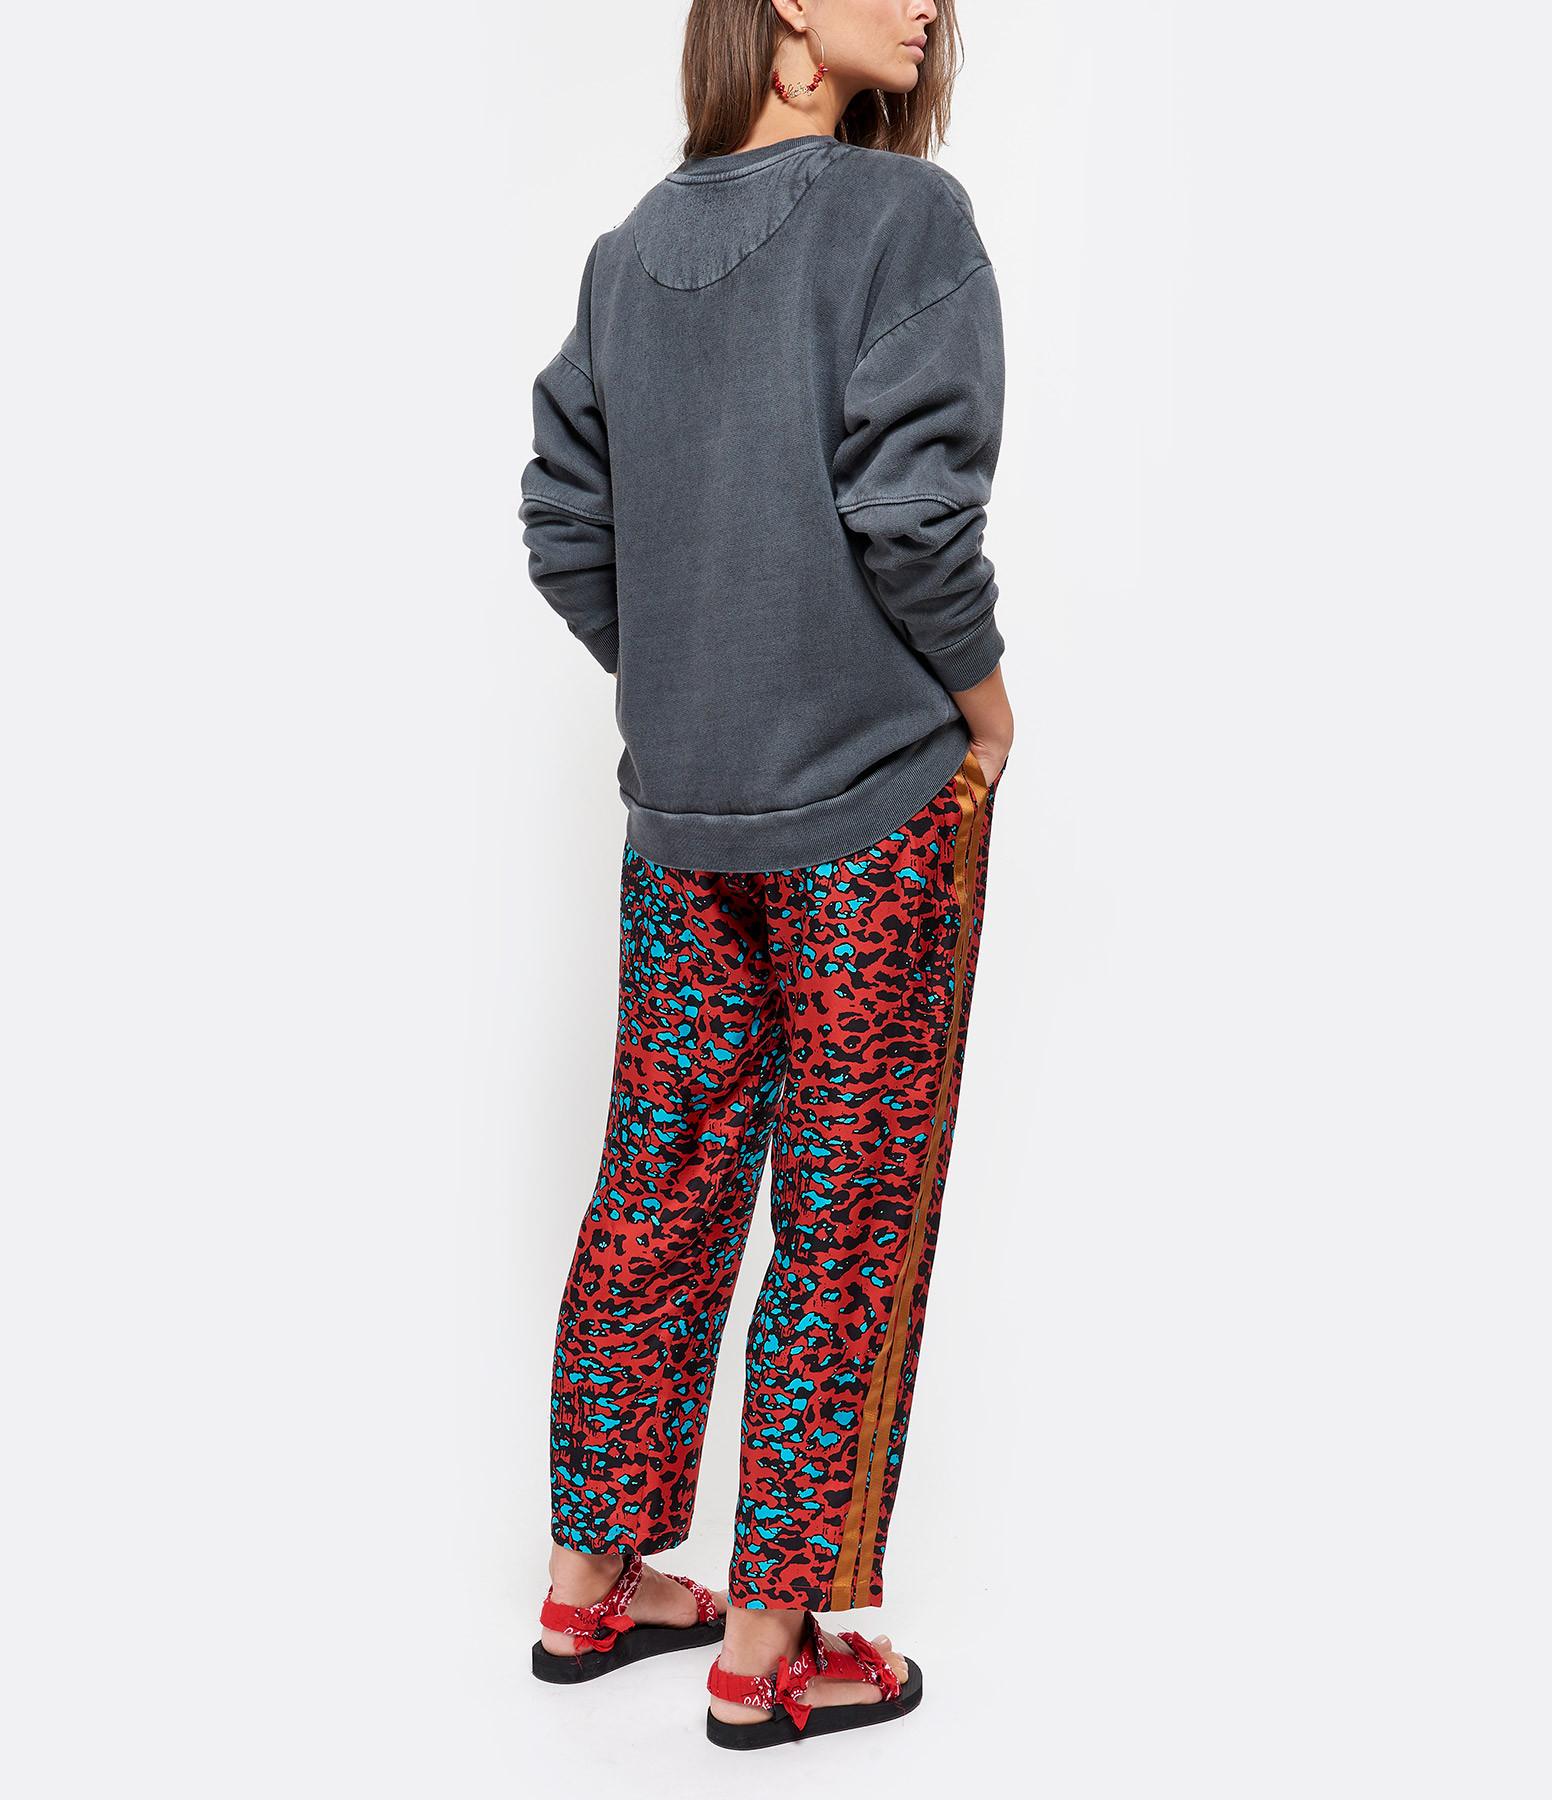 NEWTONE - Sweatshirt Roller Child Coton Pepper